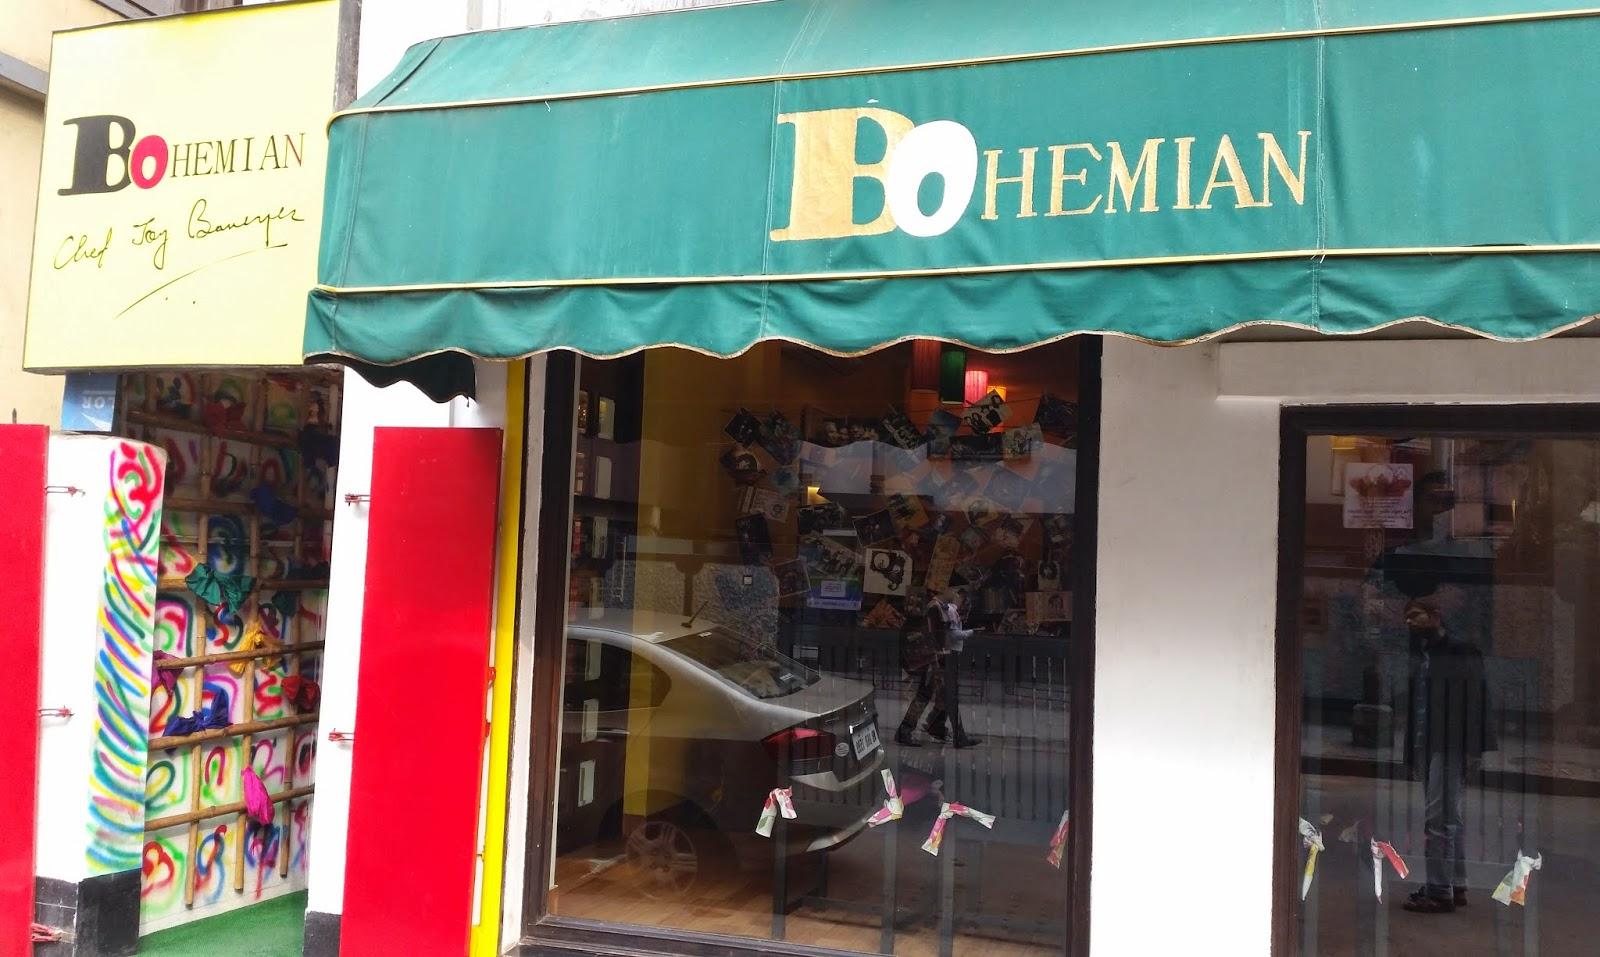 Bohemian - Restaurants In Kolkata That Every Tourists Must Visit